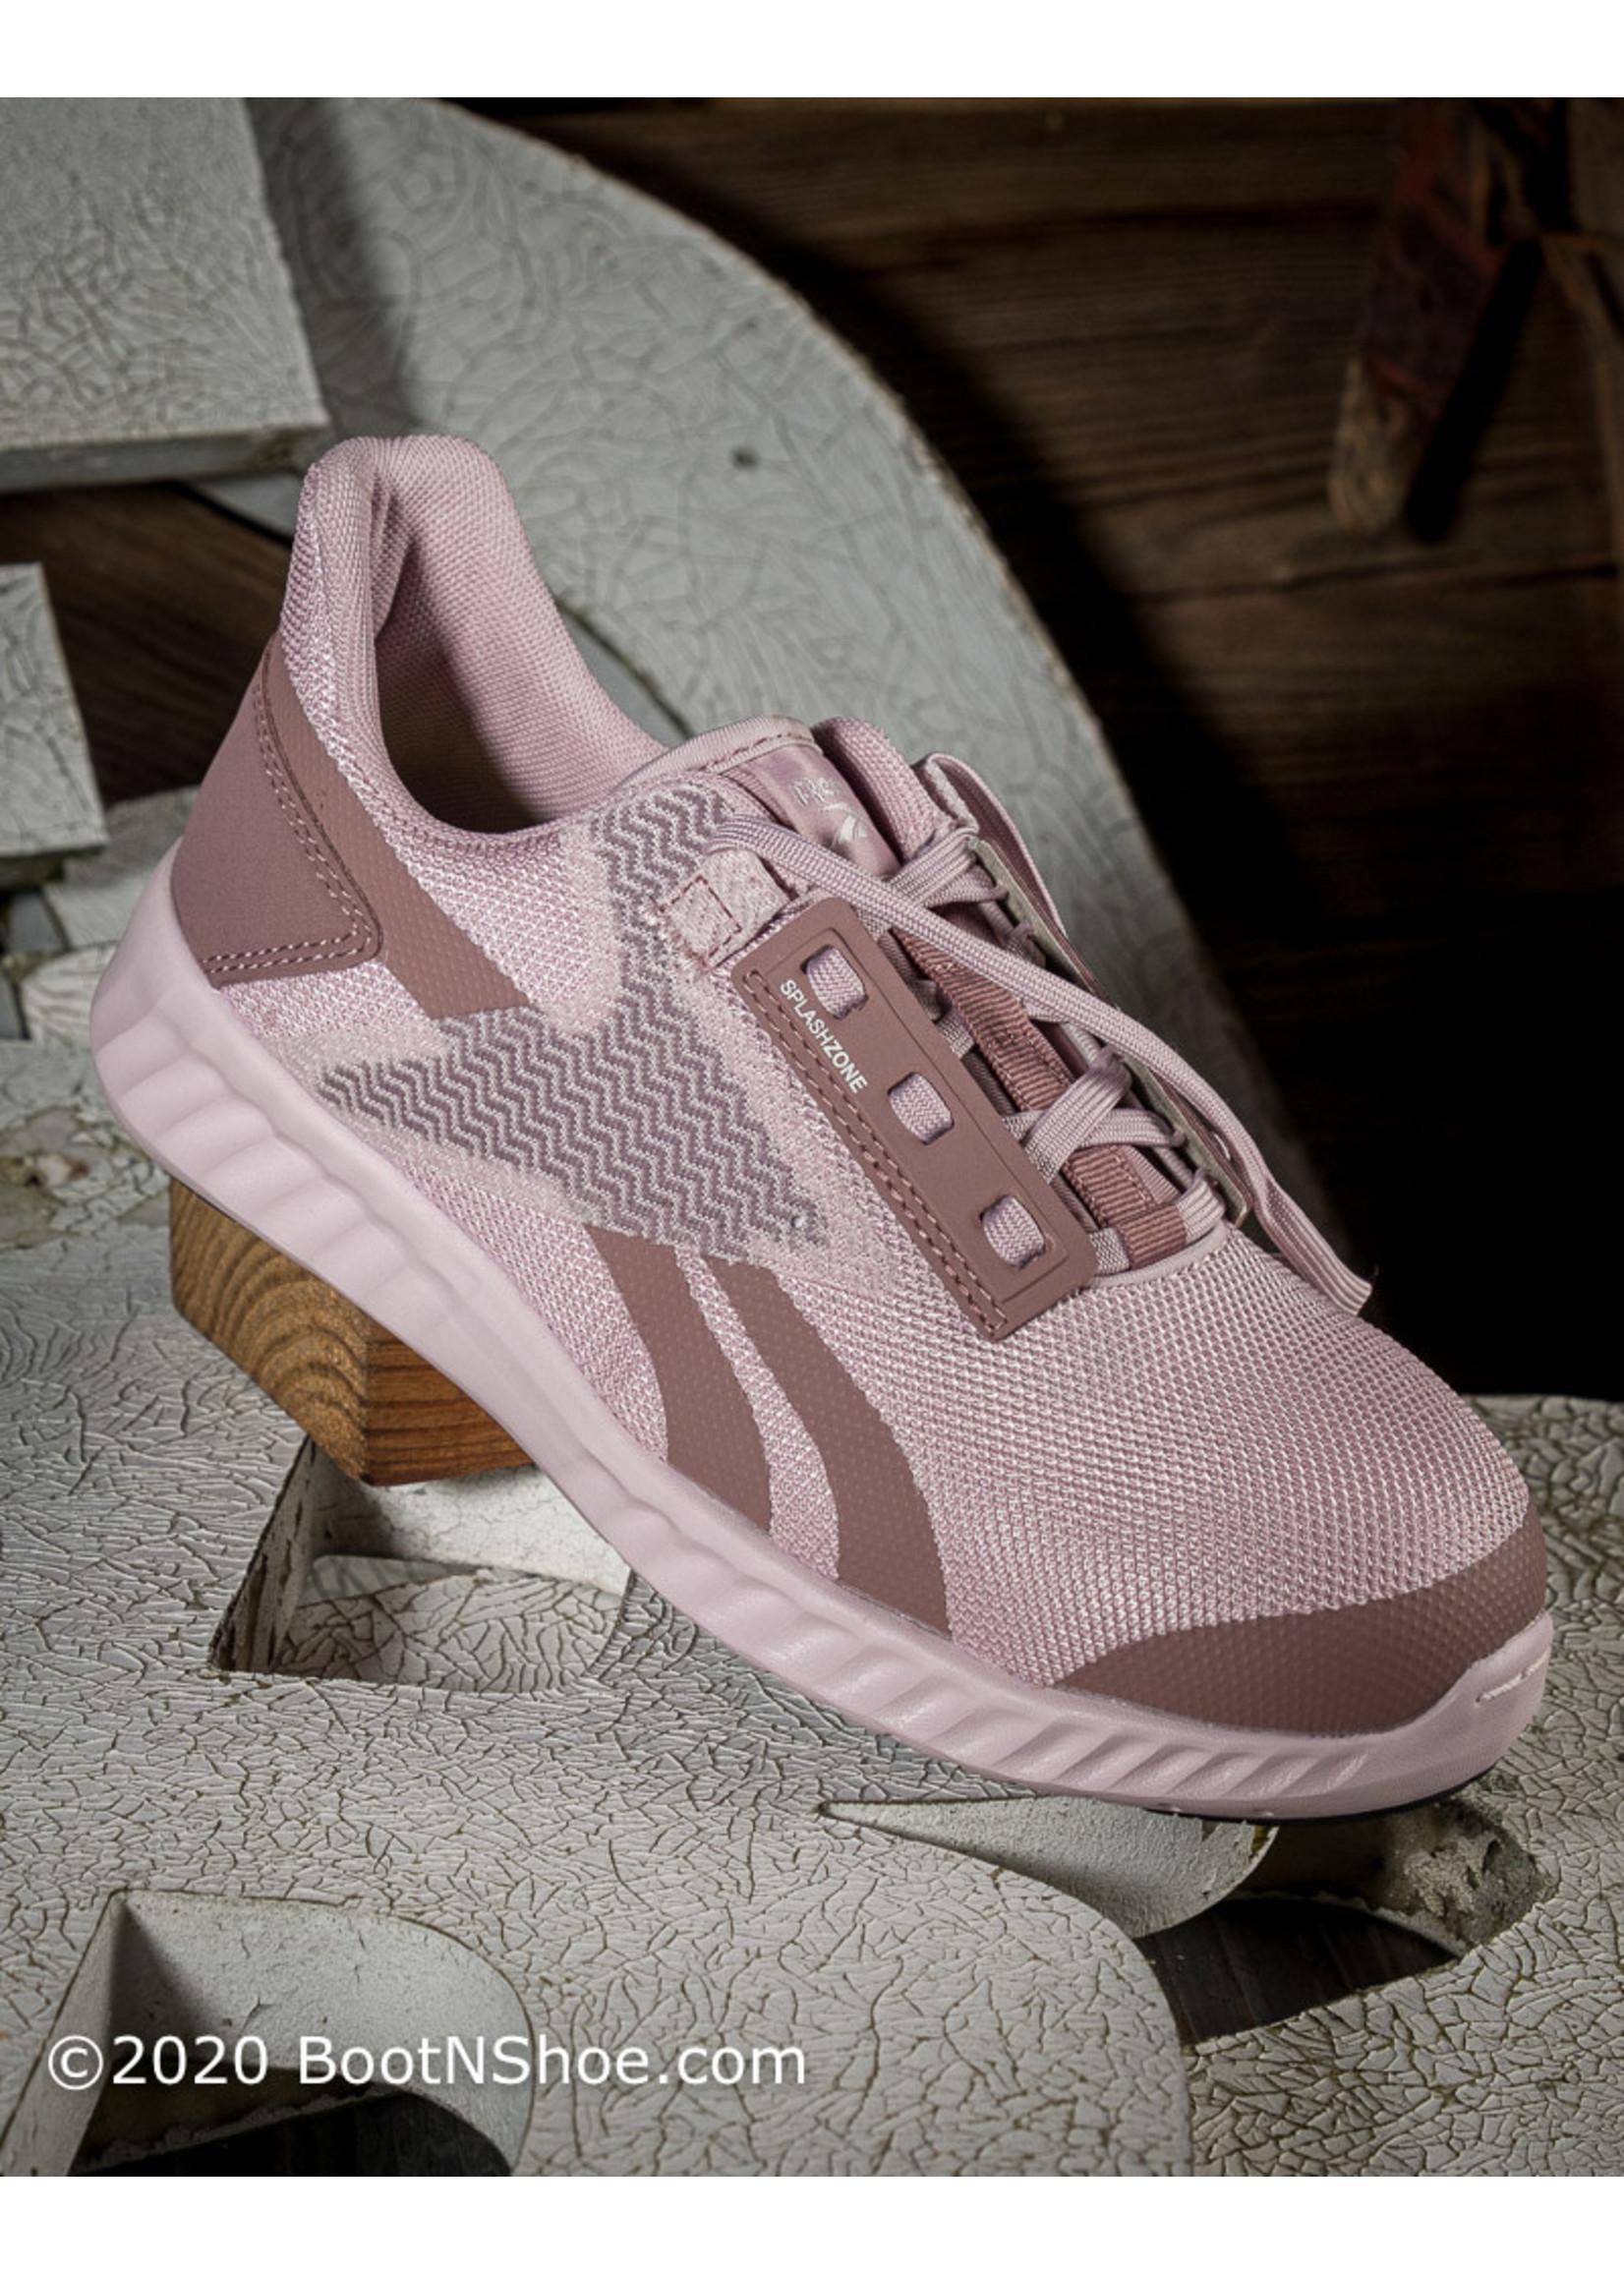 Reebok Women's Rose Gold Sublite Legend Athletic Composite Toe Work Shoe RB212